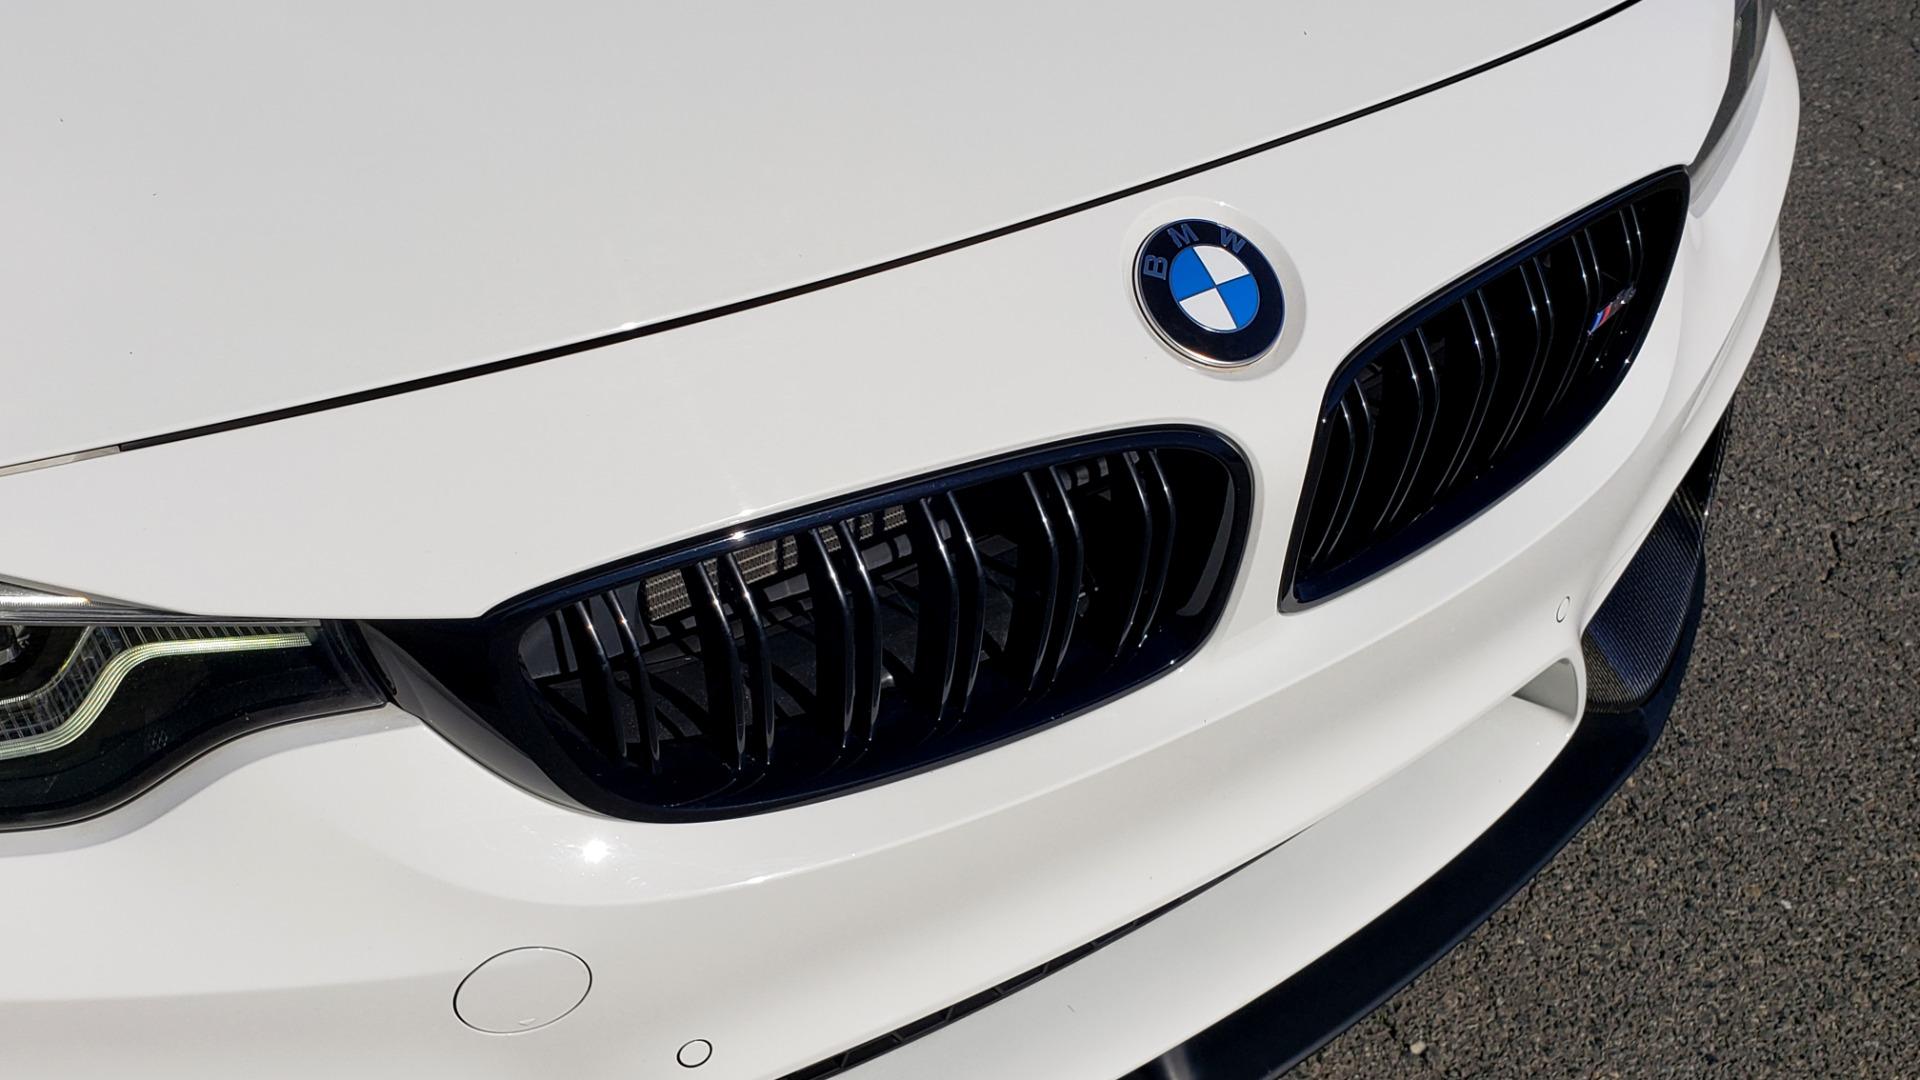 Used 2018 BMW M4 COMP PKG / EXEC / M-DRIVER / PARK CNTRL / ACTIVE BLIND SPOT for sale Sold at Formula Imports in Charlotte NC 28227 11